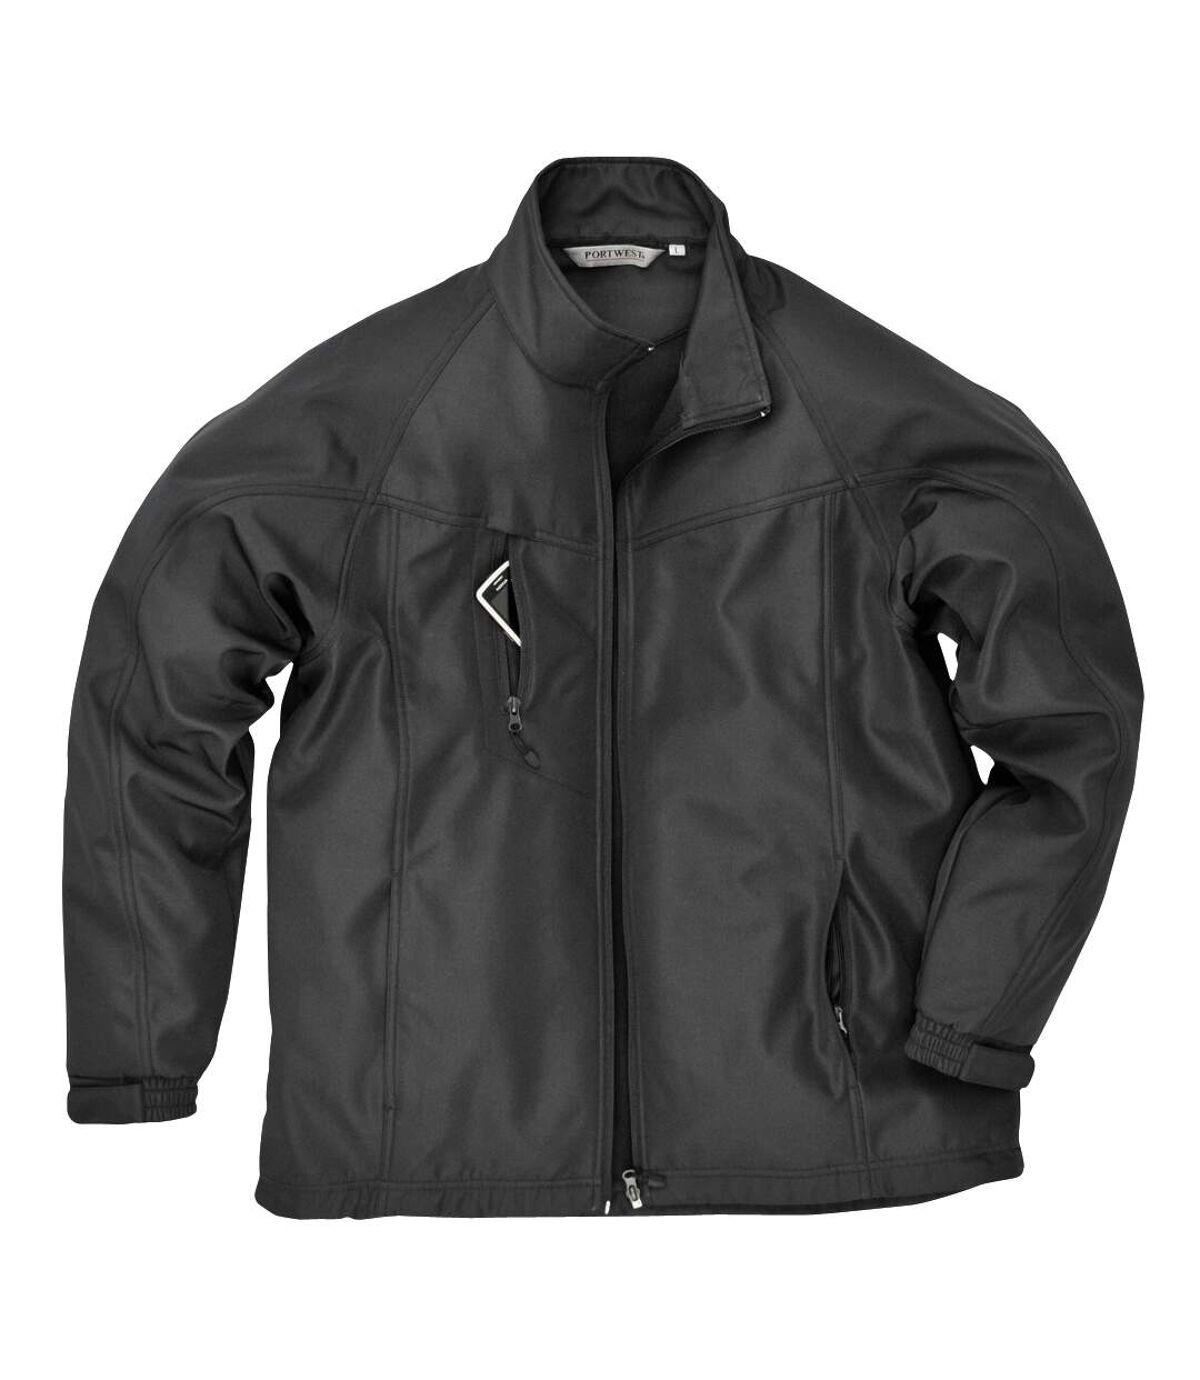 Portwest Mens Oregon Soft Shell Jacket (Black) - UTRW1019